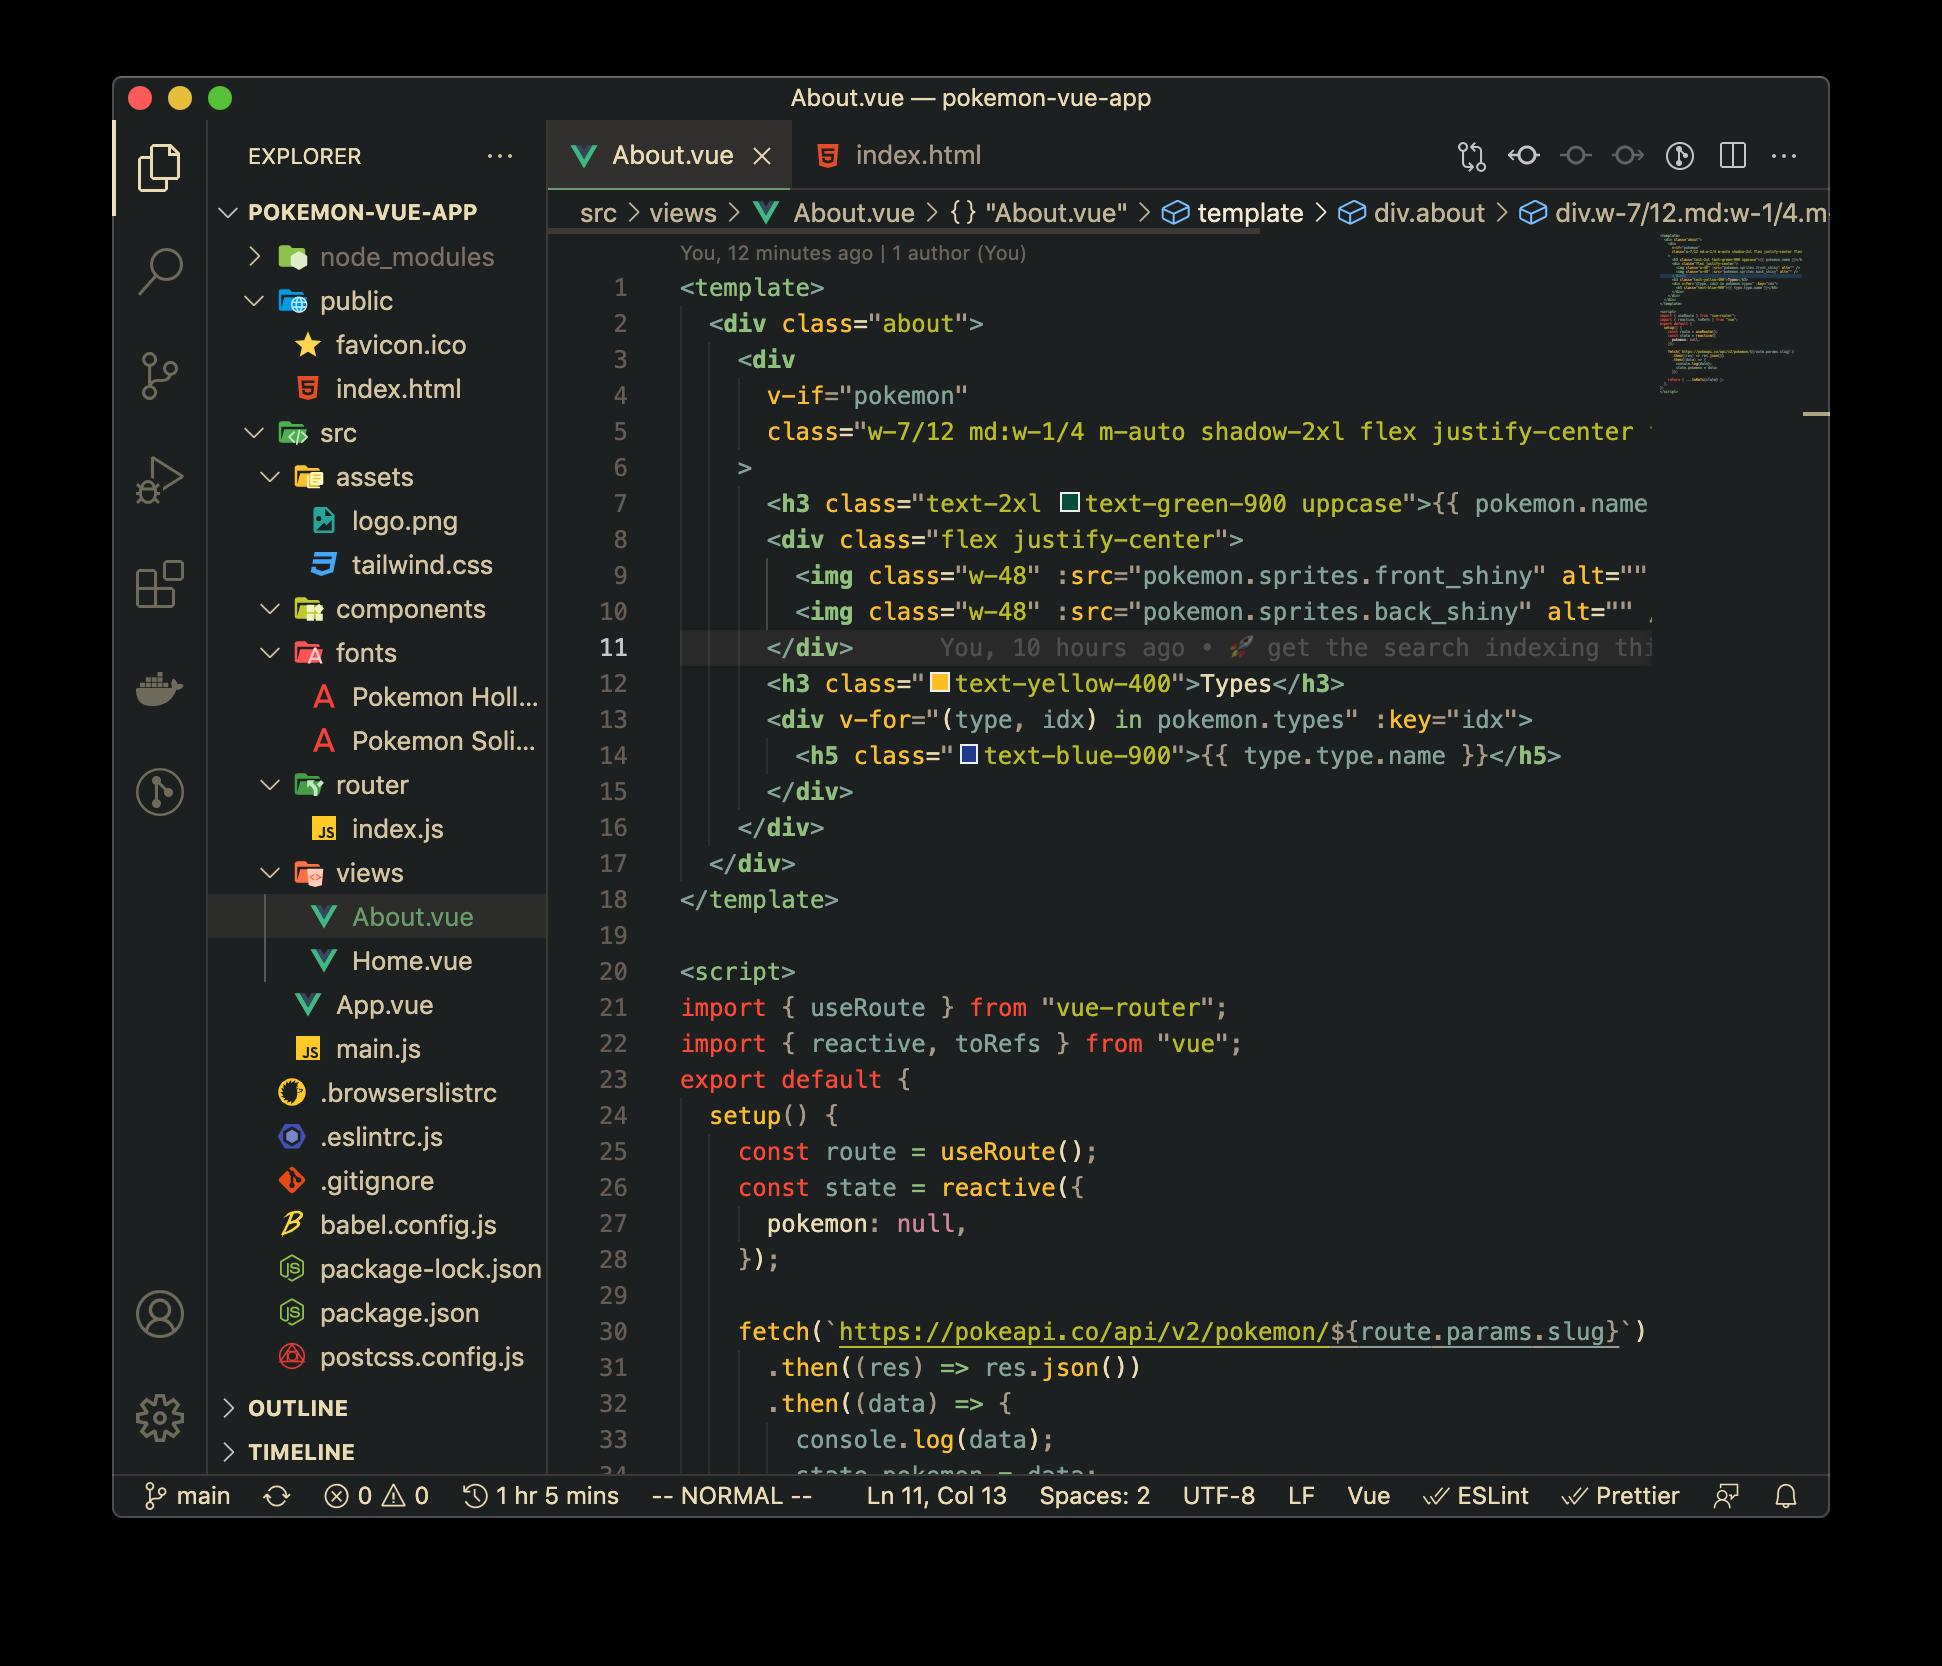 https://cloud-hg6ubki7h-hack-club-bot.vercel.app/0screen_shot_2021-05-31_at_11.13.14_am.png